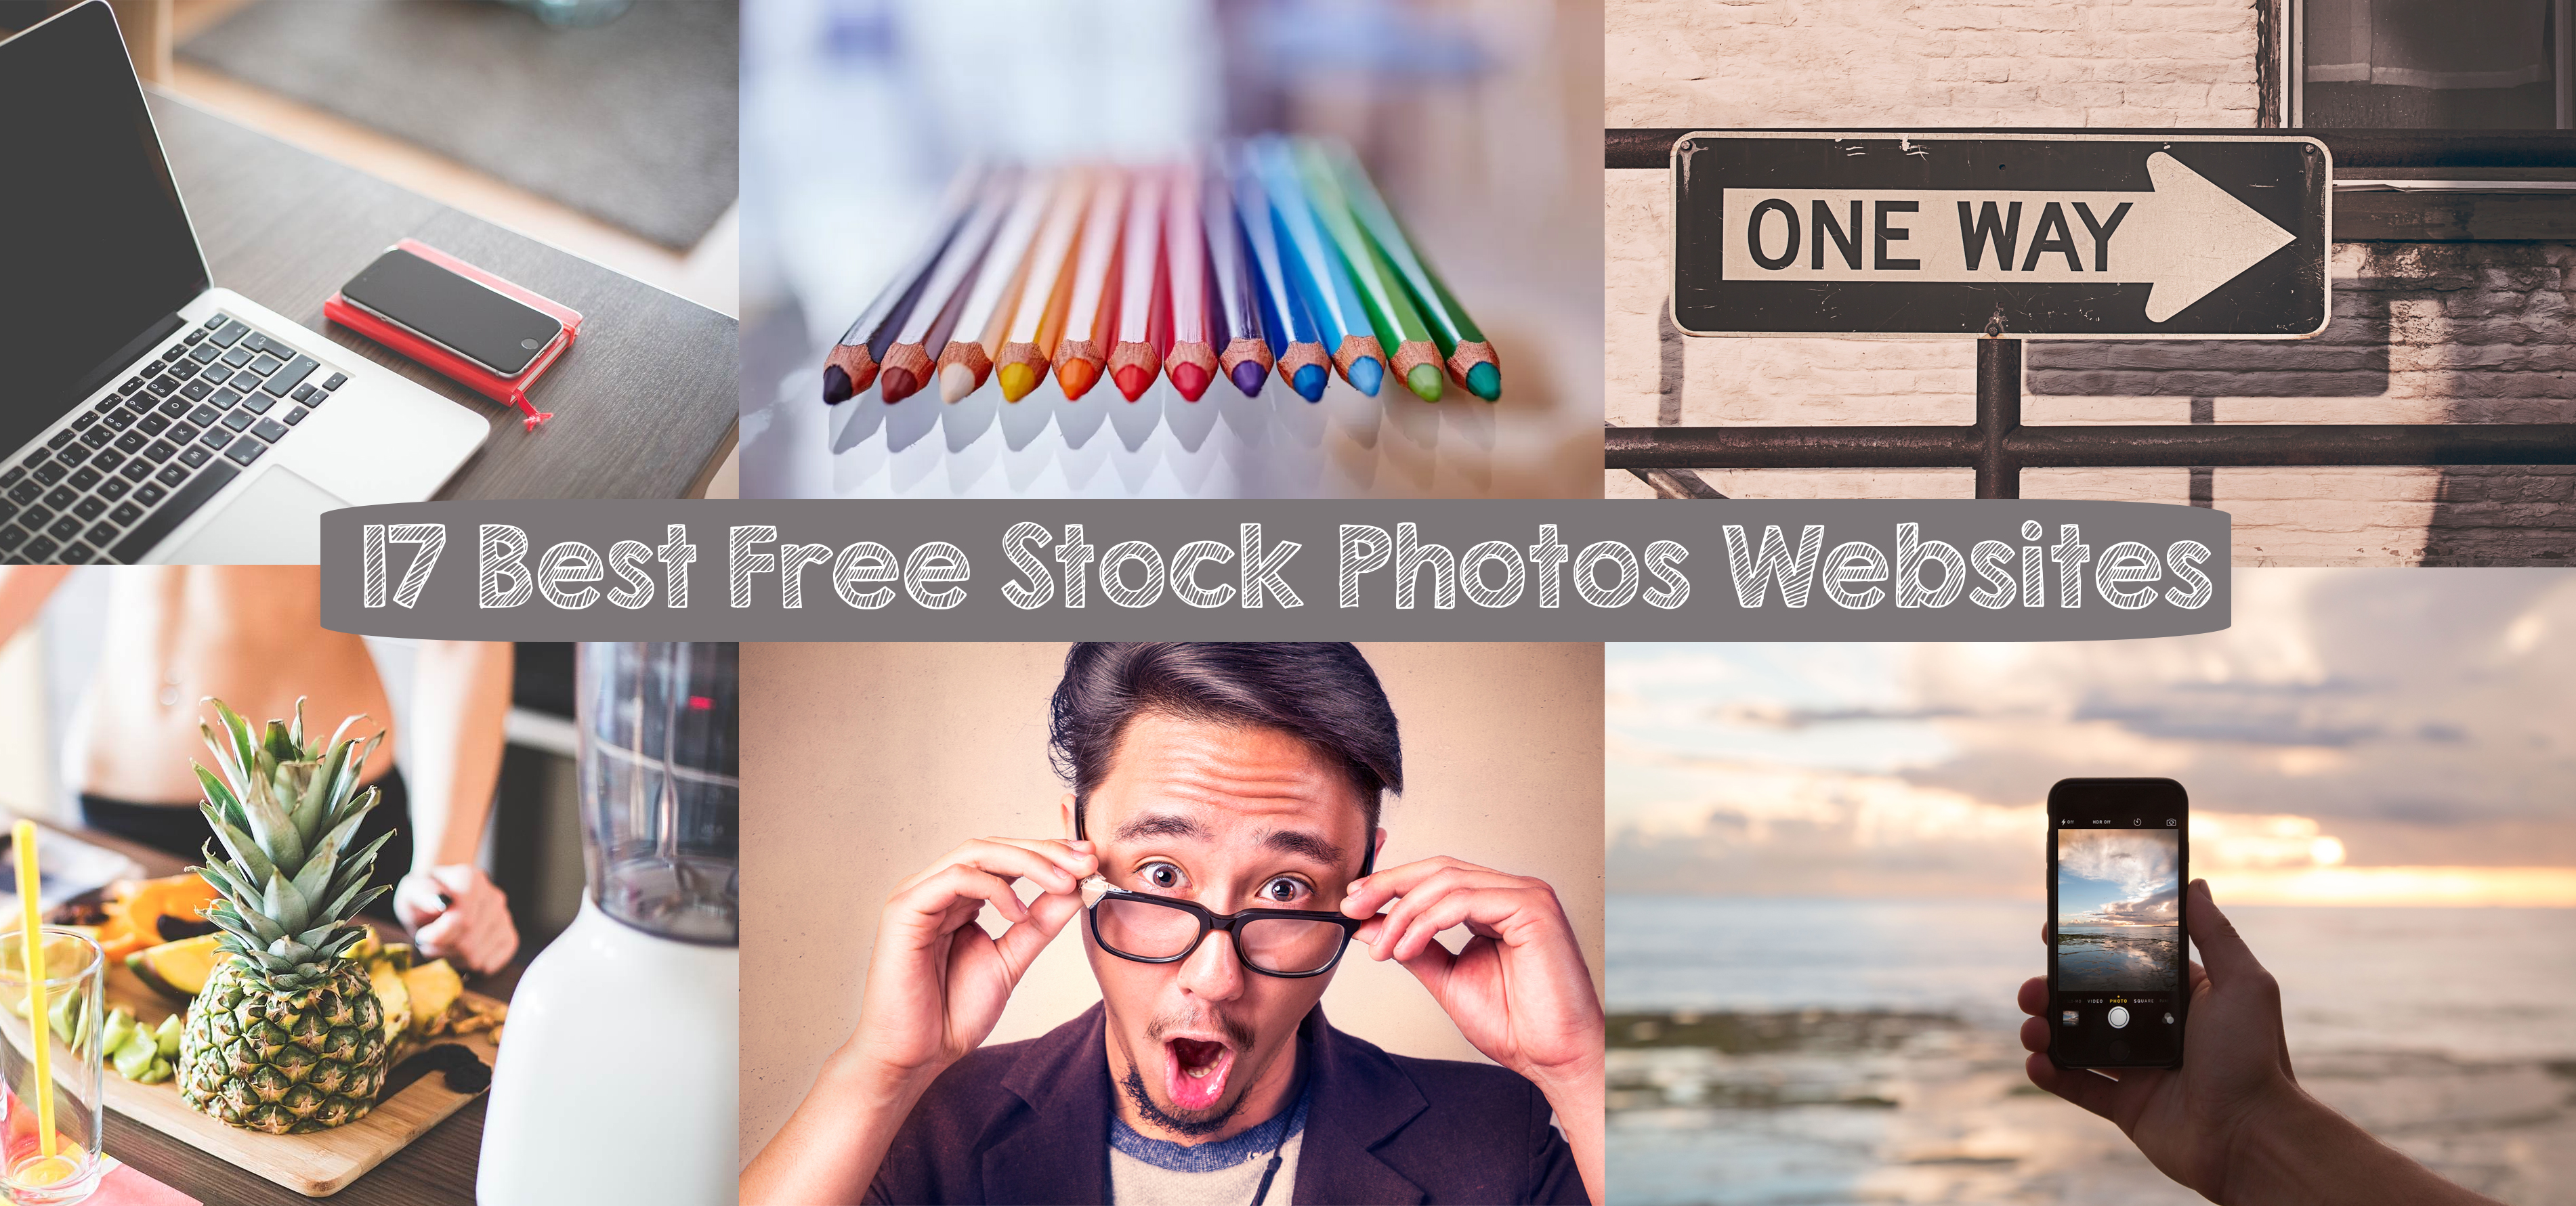 17 Best Free Stock Photos Websites